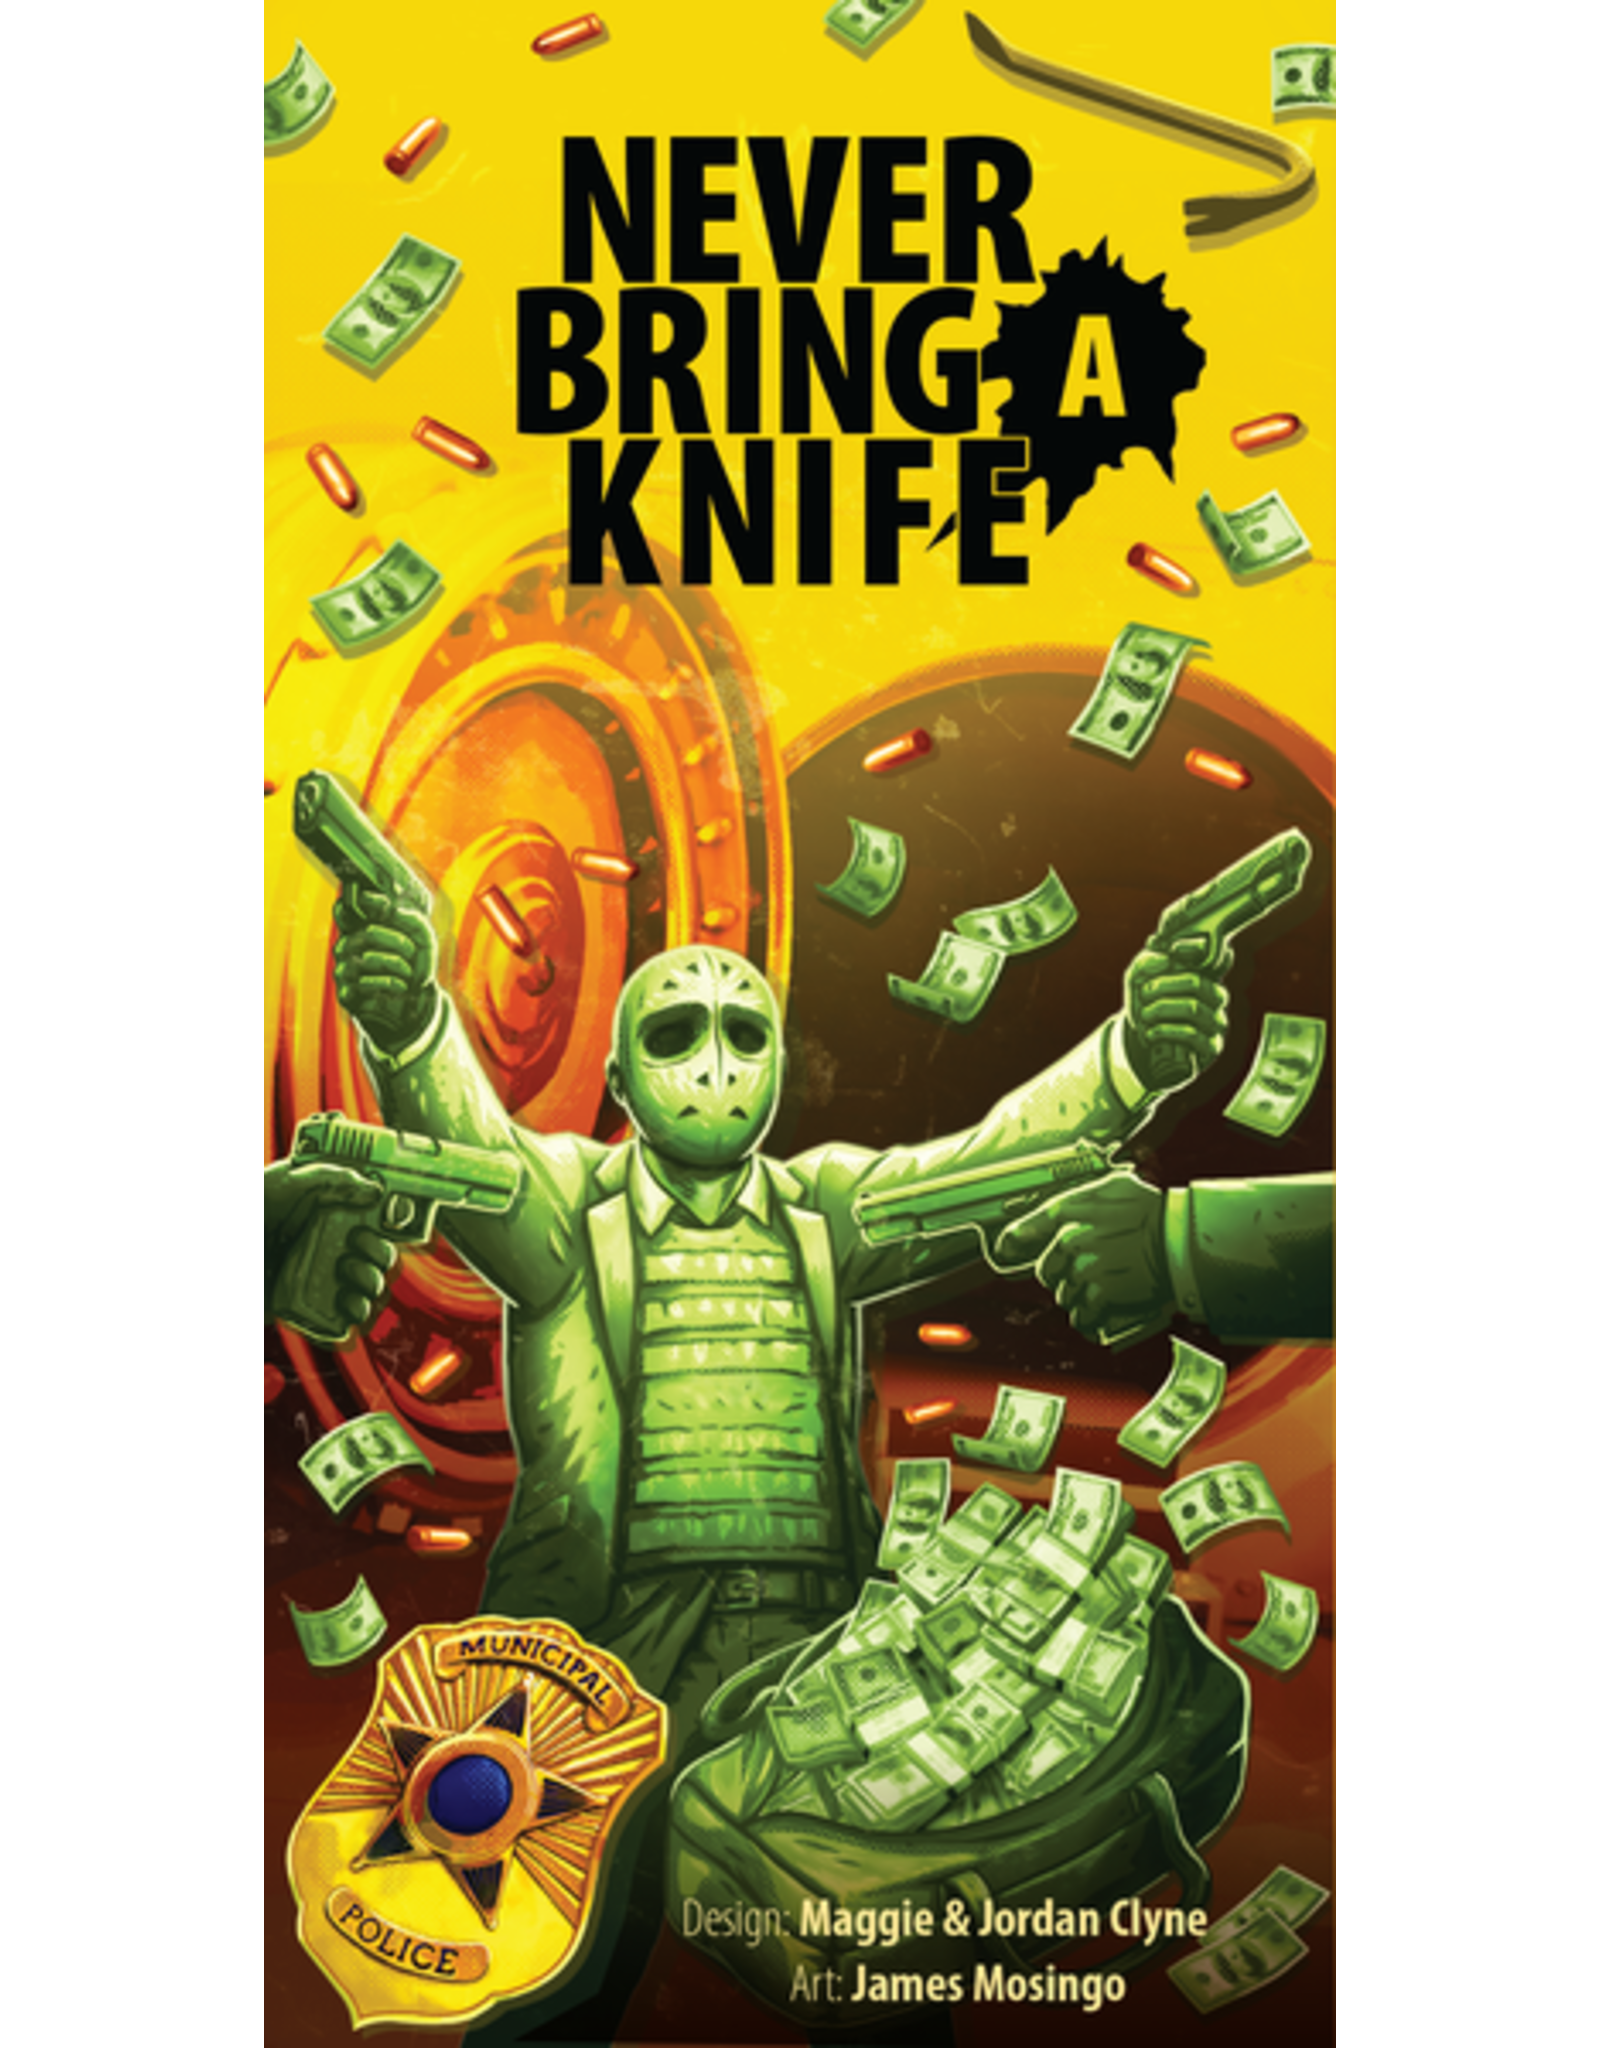 ATLAS GAMES NEVER BRING A KNIFE